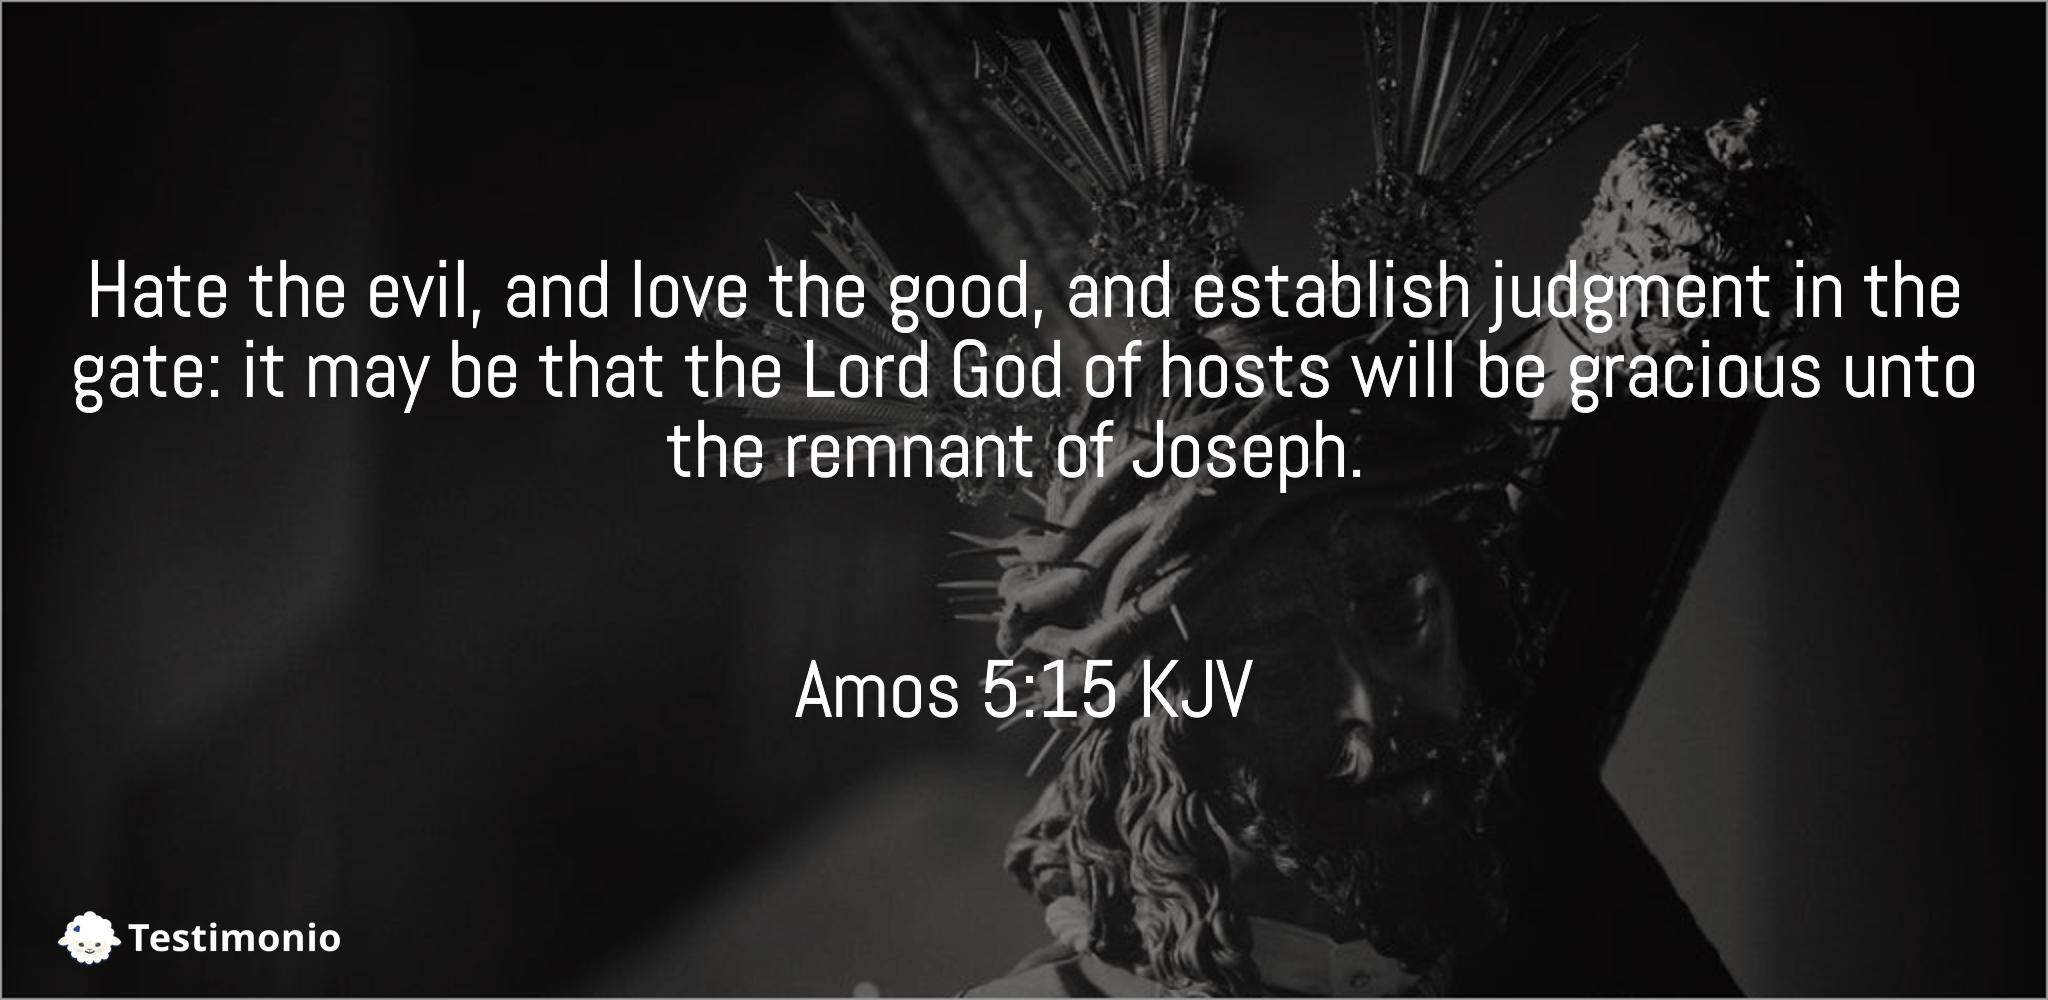 Amos 5:15